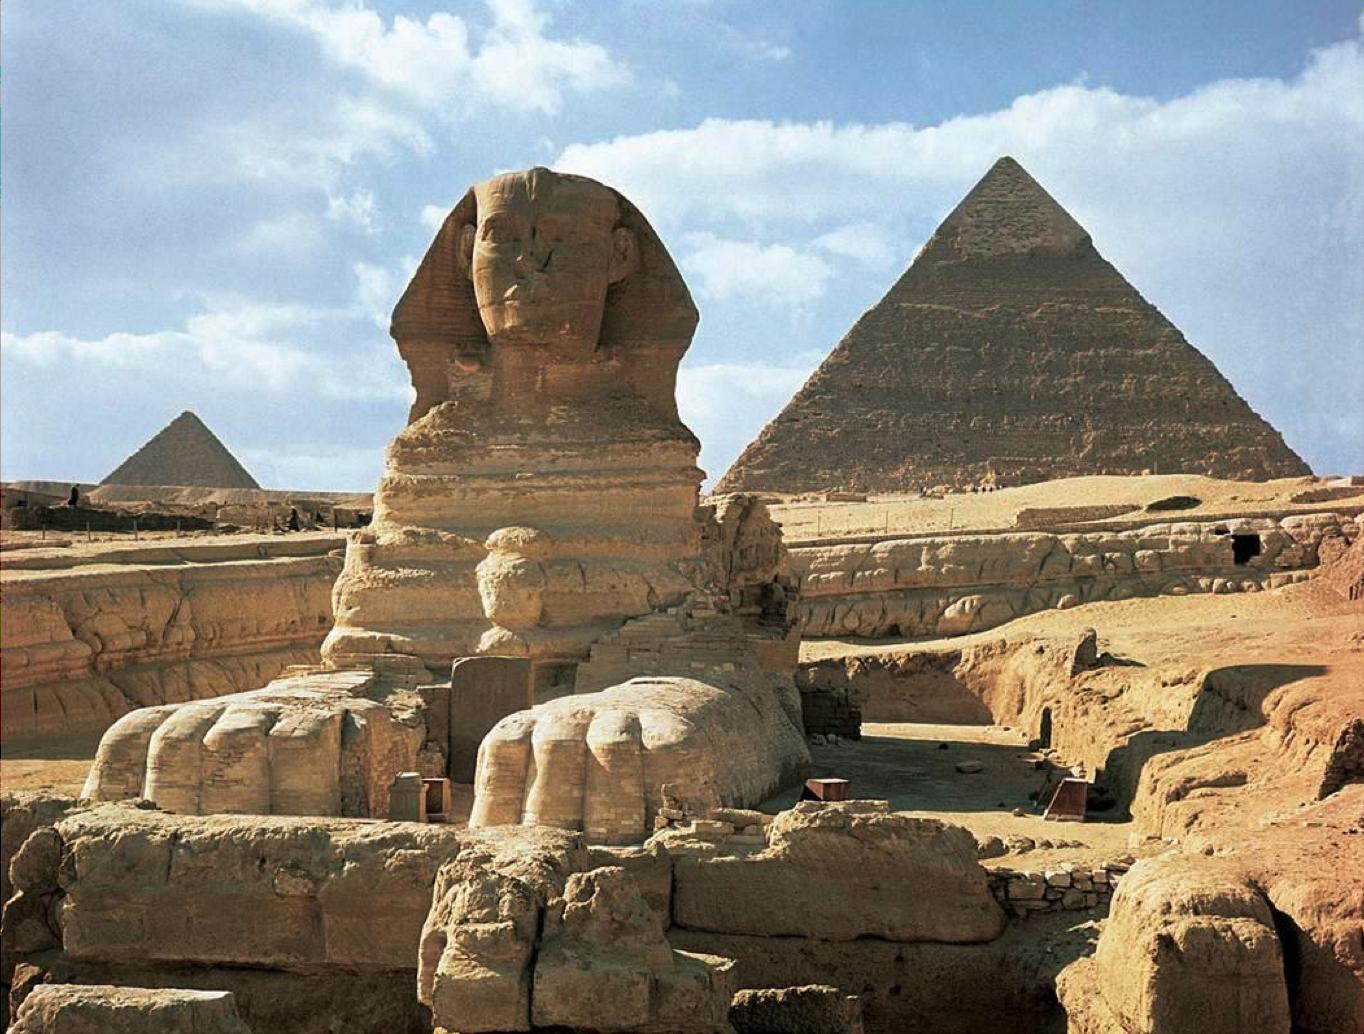 Great Pyramids Menkaura Khafre Khufu And Great Sphinx Giza Egypt Old Kingdom Fourth Dynasty C 2550 2490 Bce Lim Egypt Ap Art History 250 Art History